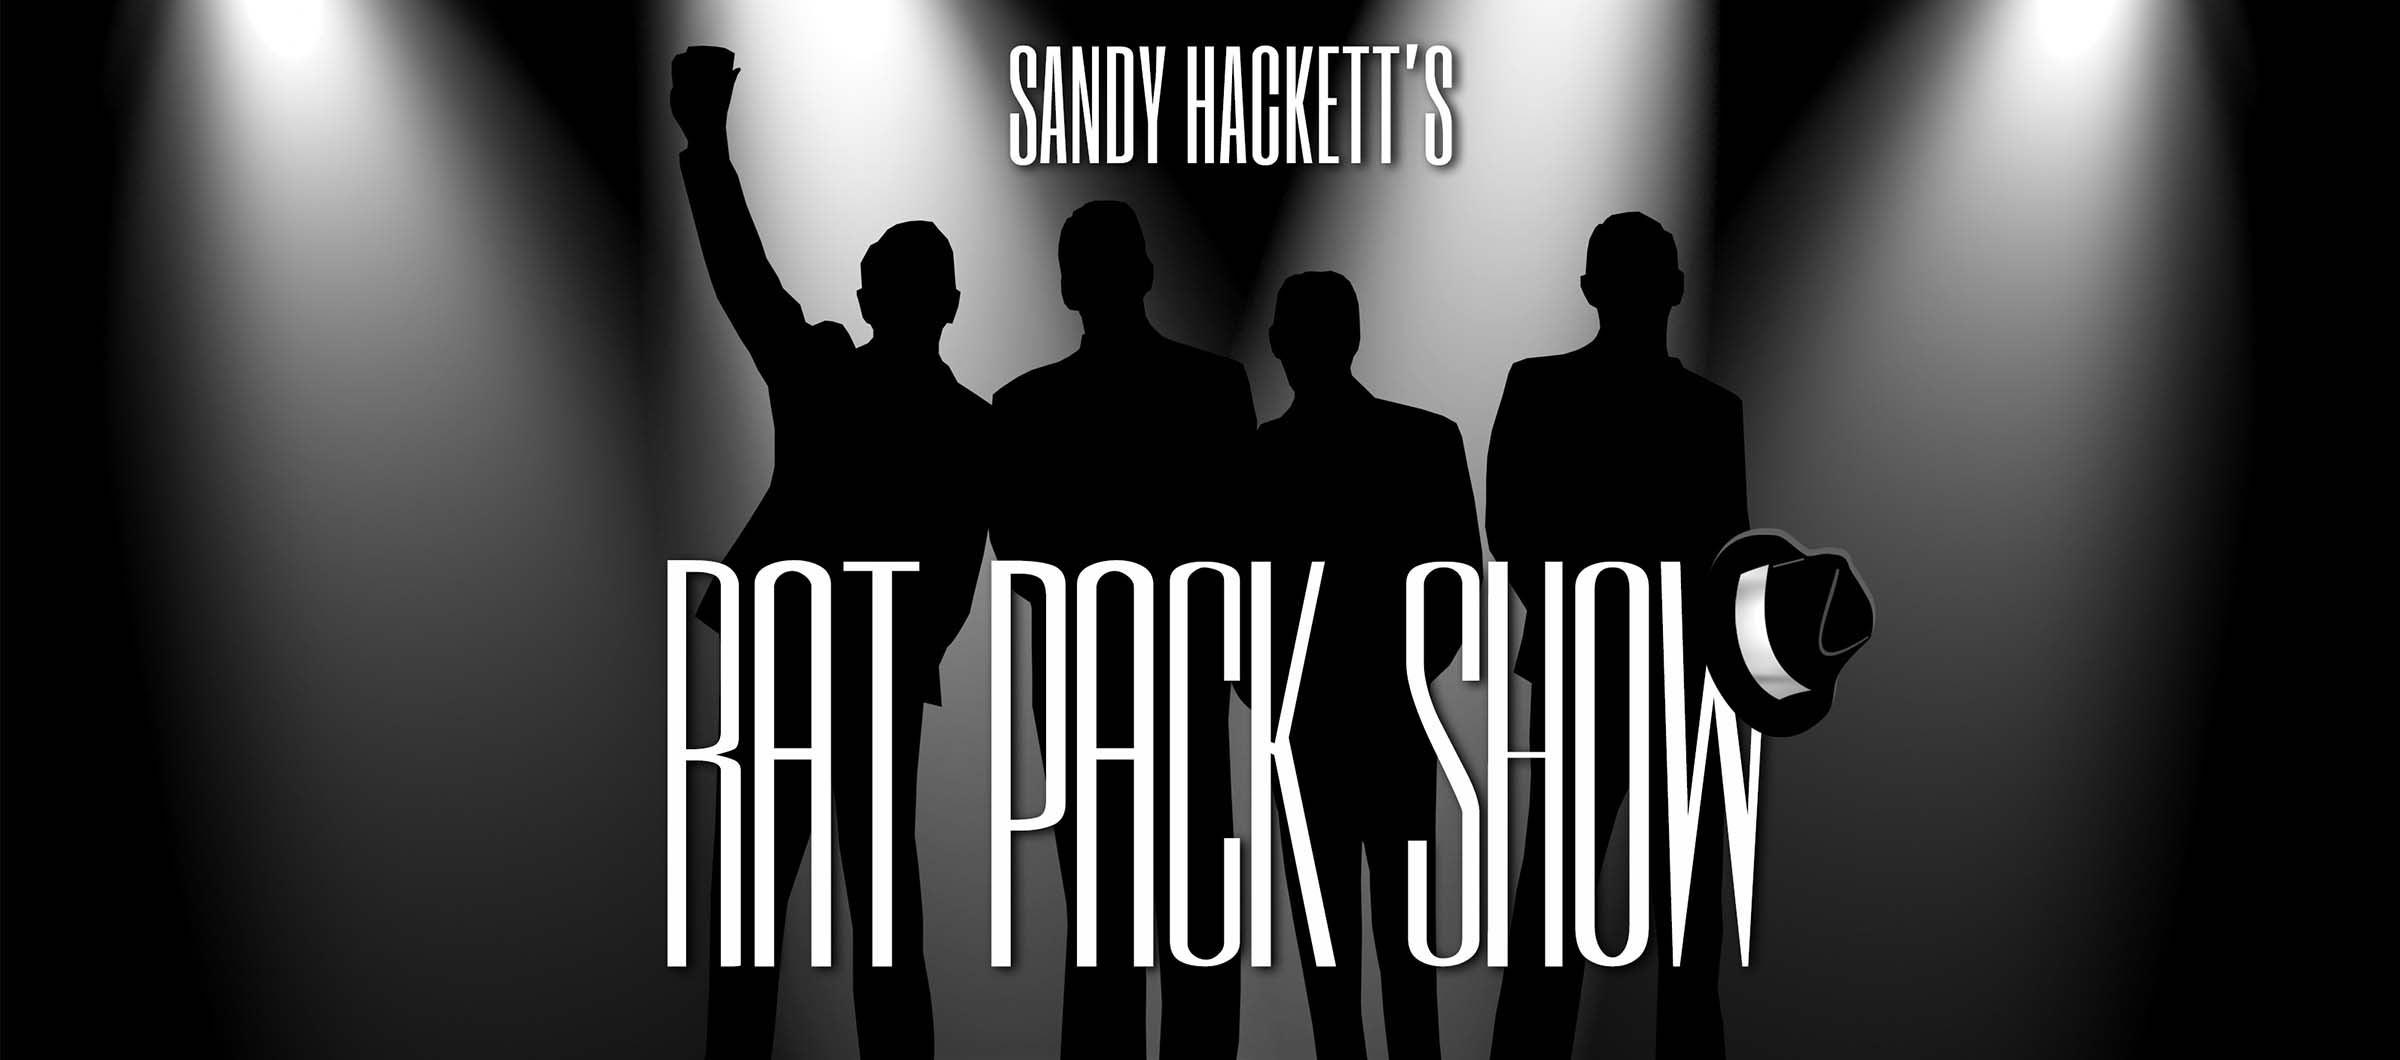 Sandy Hackett's The Rat Pack